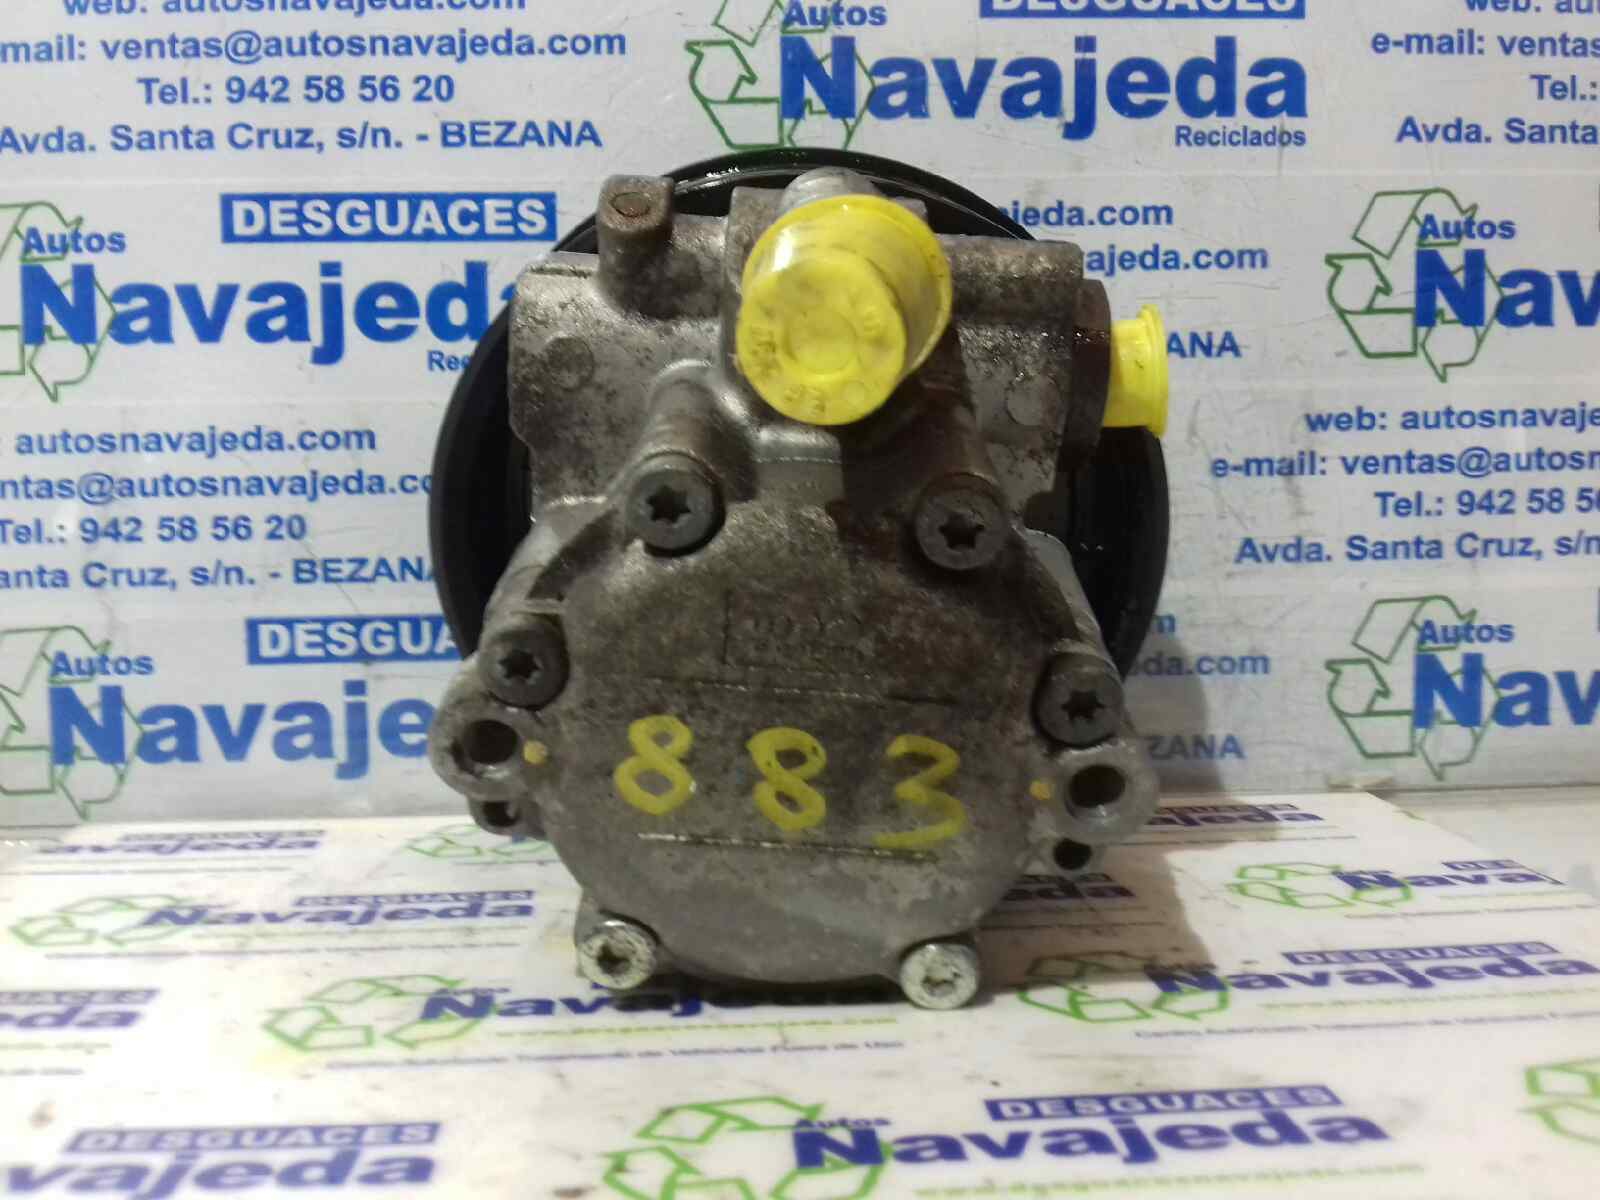 Steering Pump Renault Trafic Ii Box Fl 20 Dci 115 Fl01 Fl0u 369919 Under Bonnet Fuse 76139555777613955577